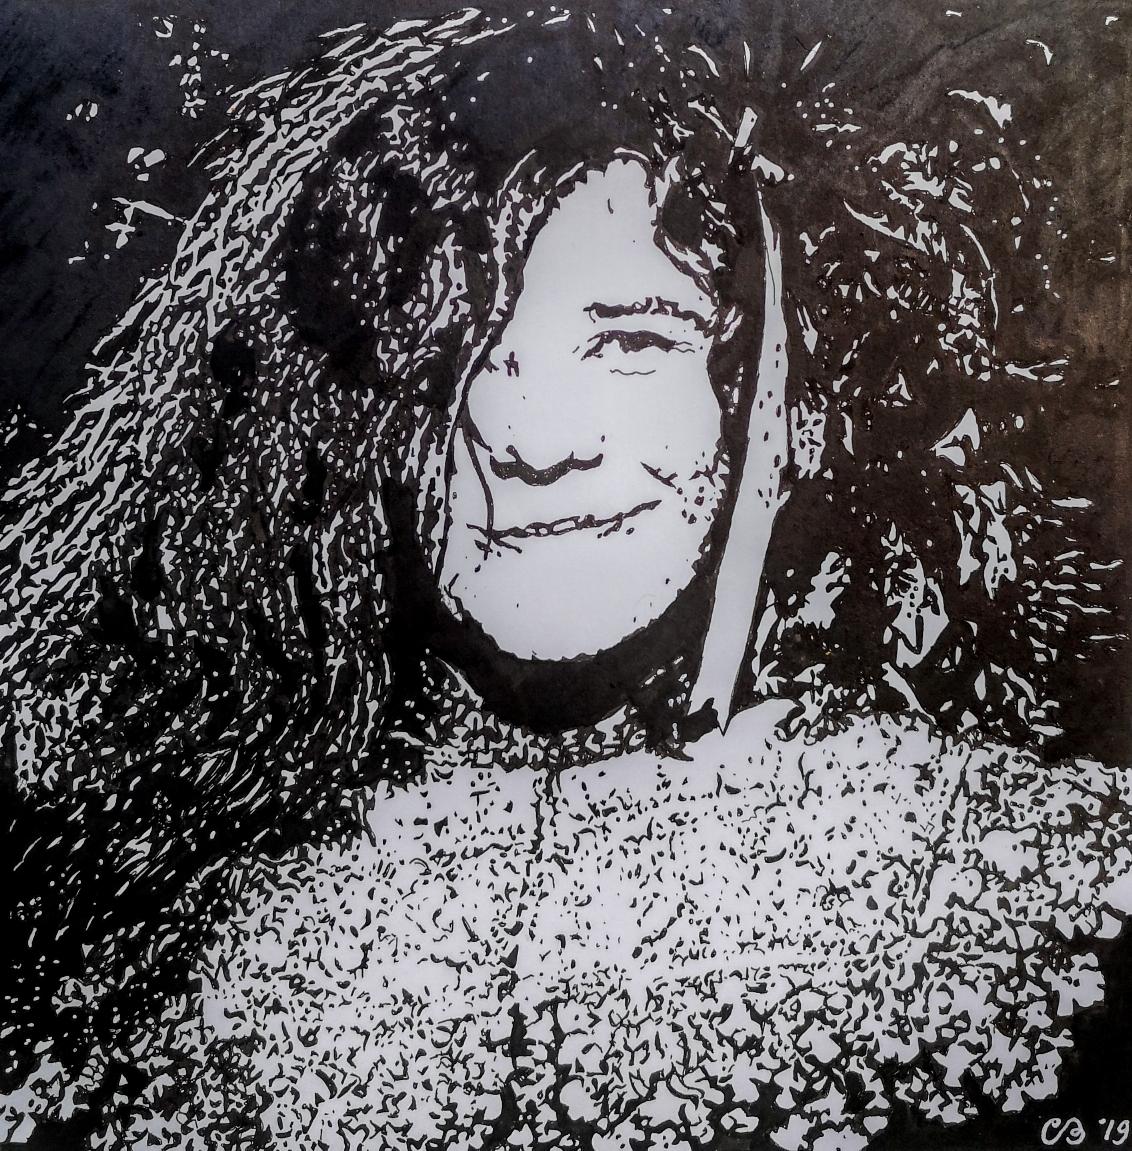 Rembrandt style Janis Joplin